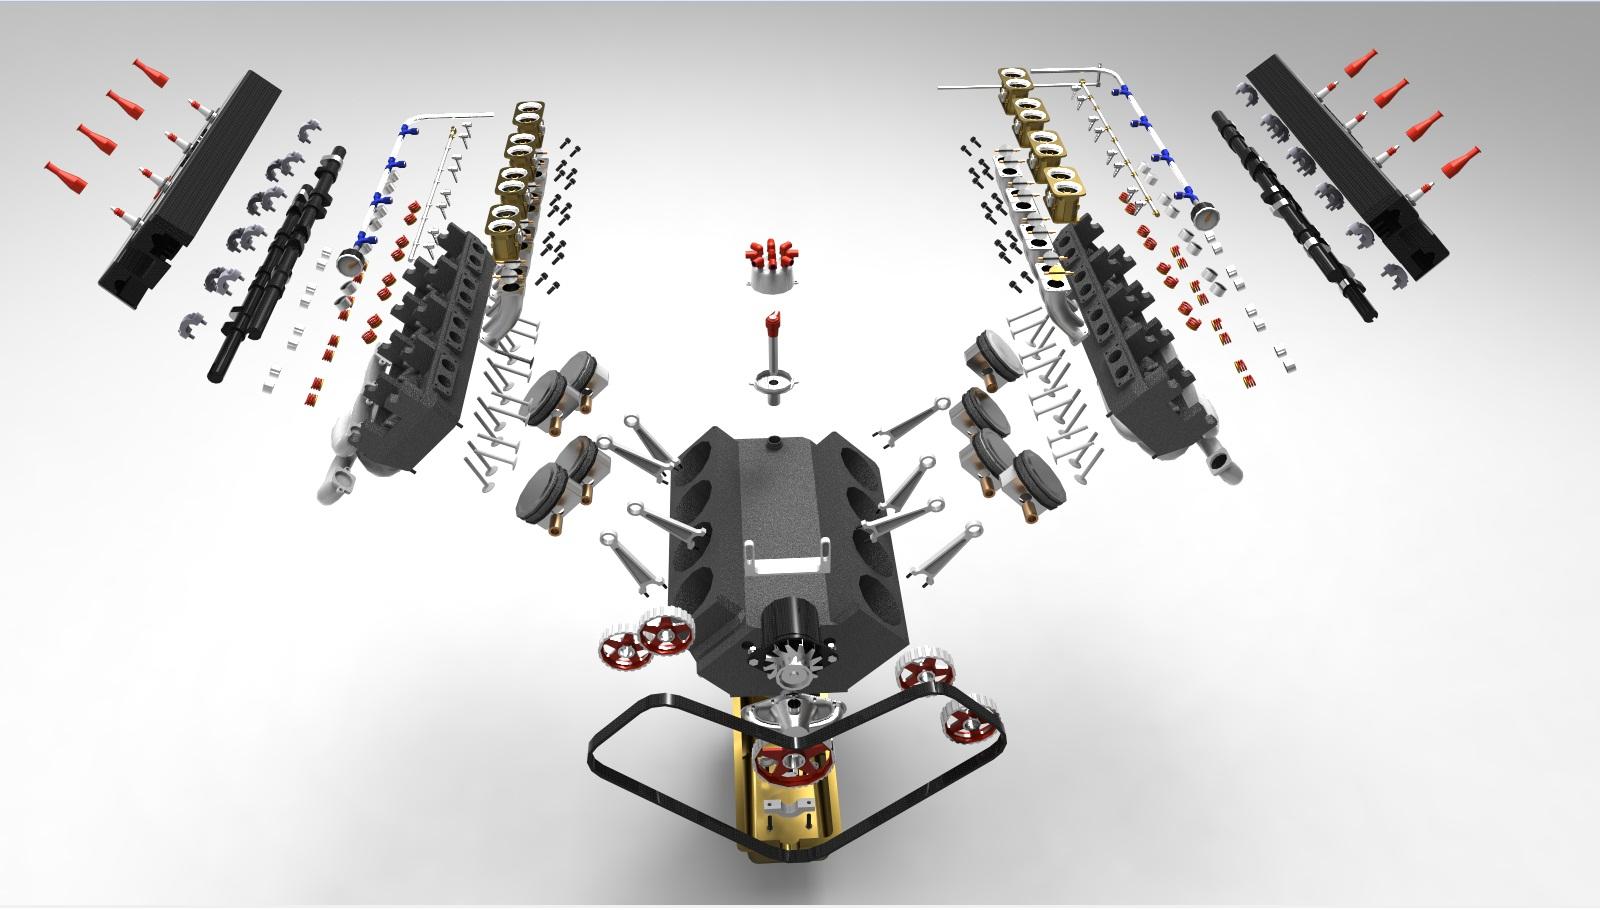 zama carburetor parts diagram 1998 dodge ram 3500 radio wiring likewise mack trucks engine exploded wire data schema